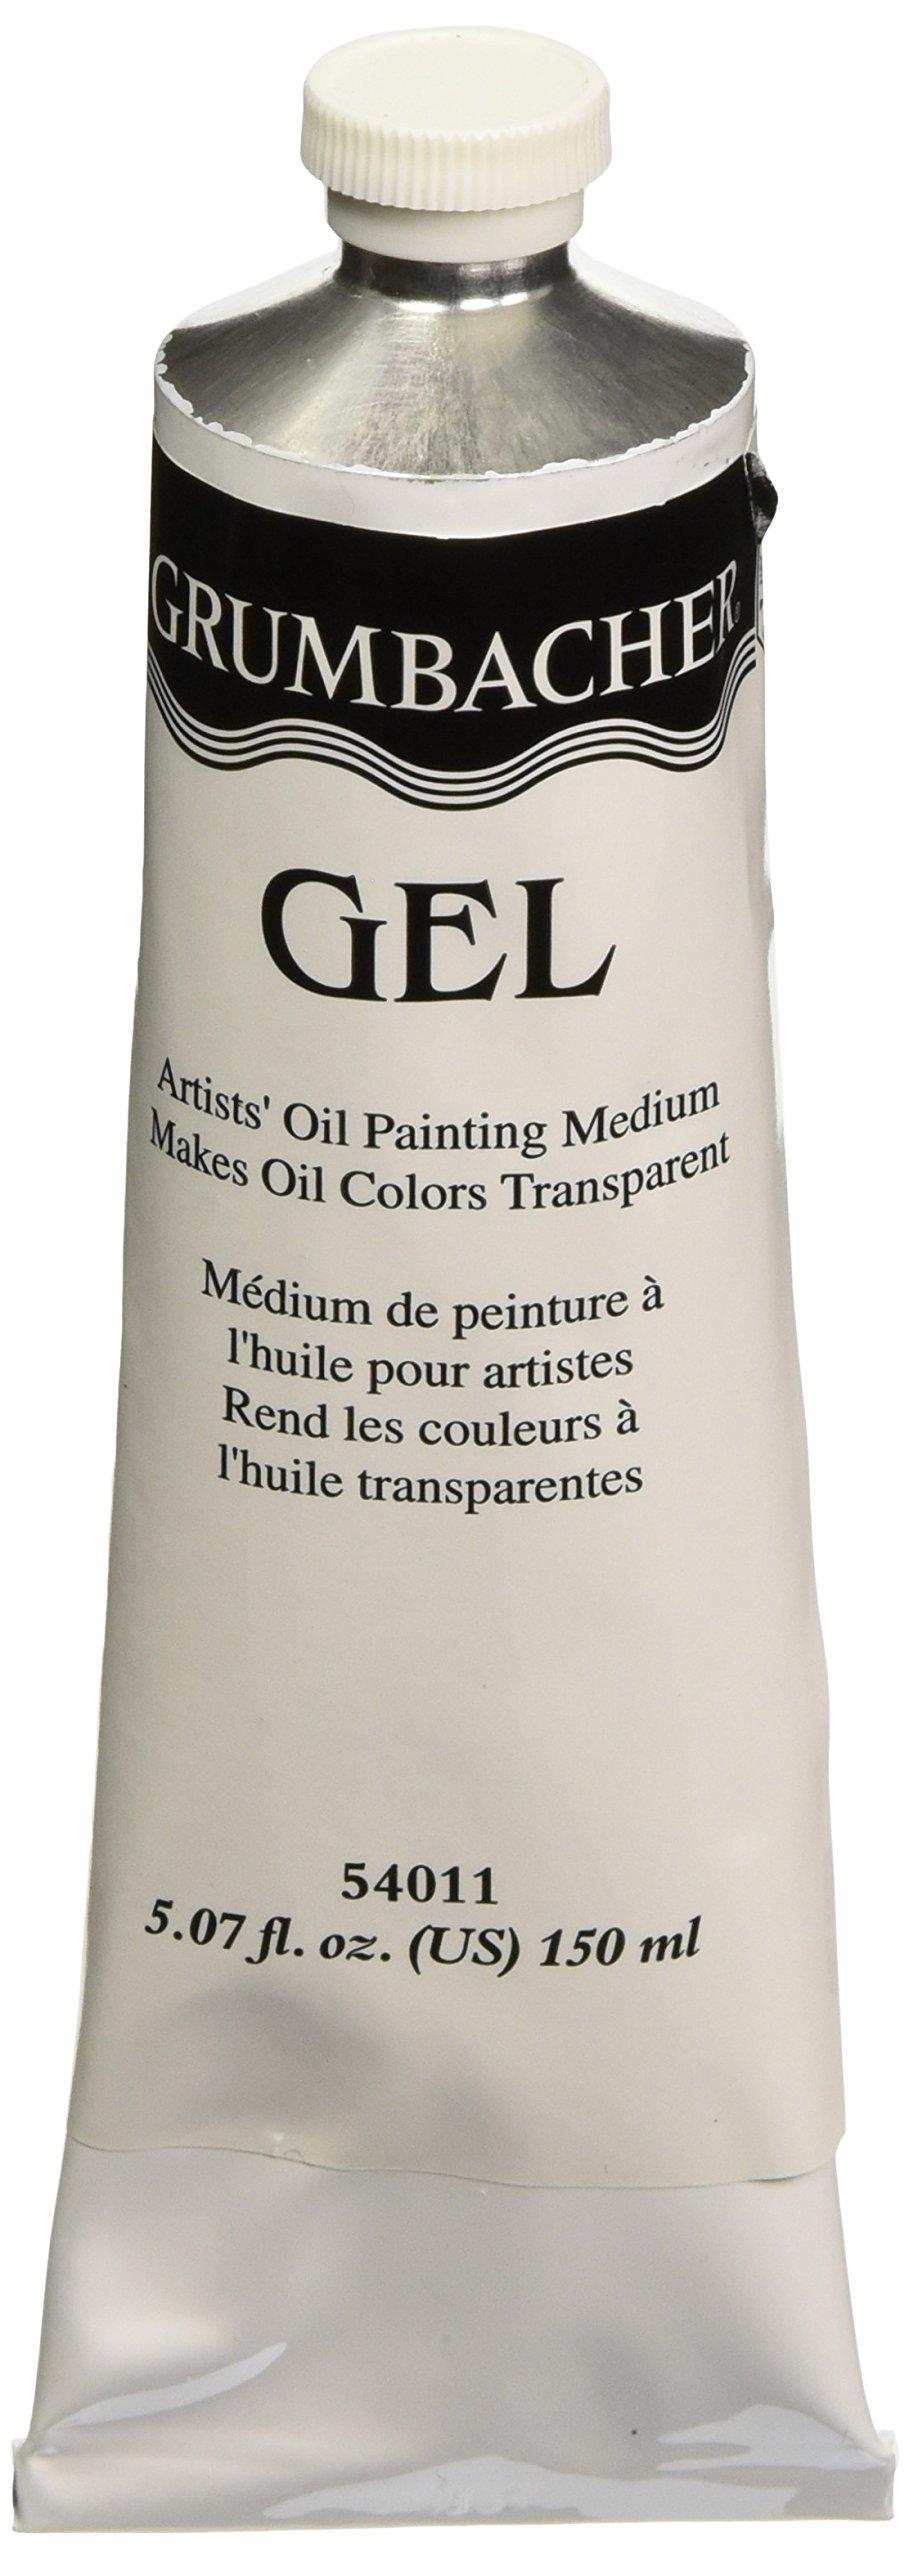 Grumbacher Transperentizer Gel for Oil Colors, 5 oz Tube